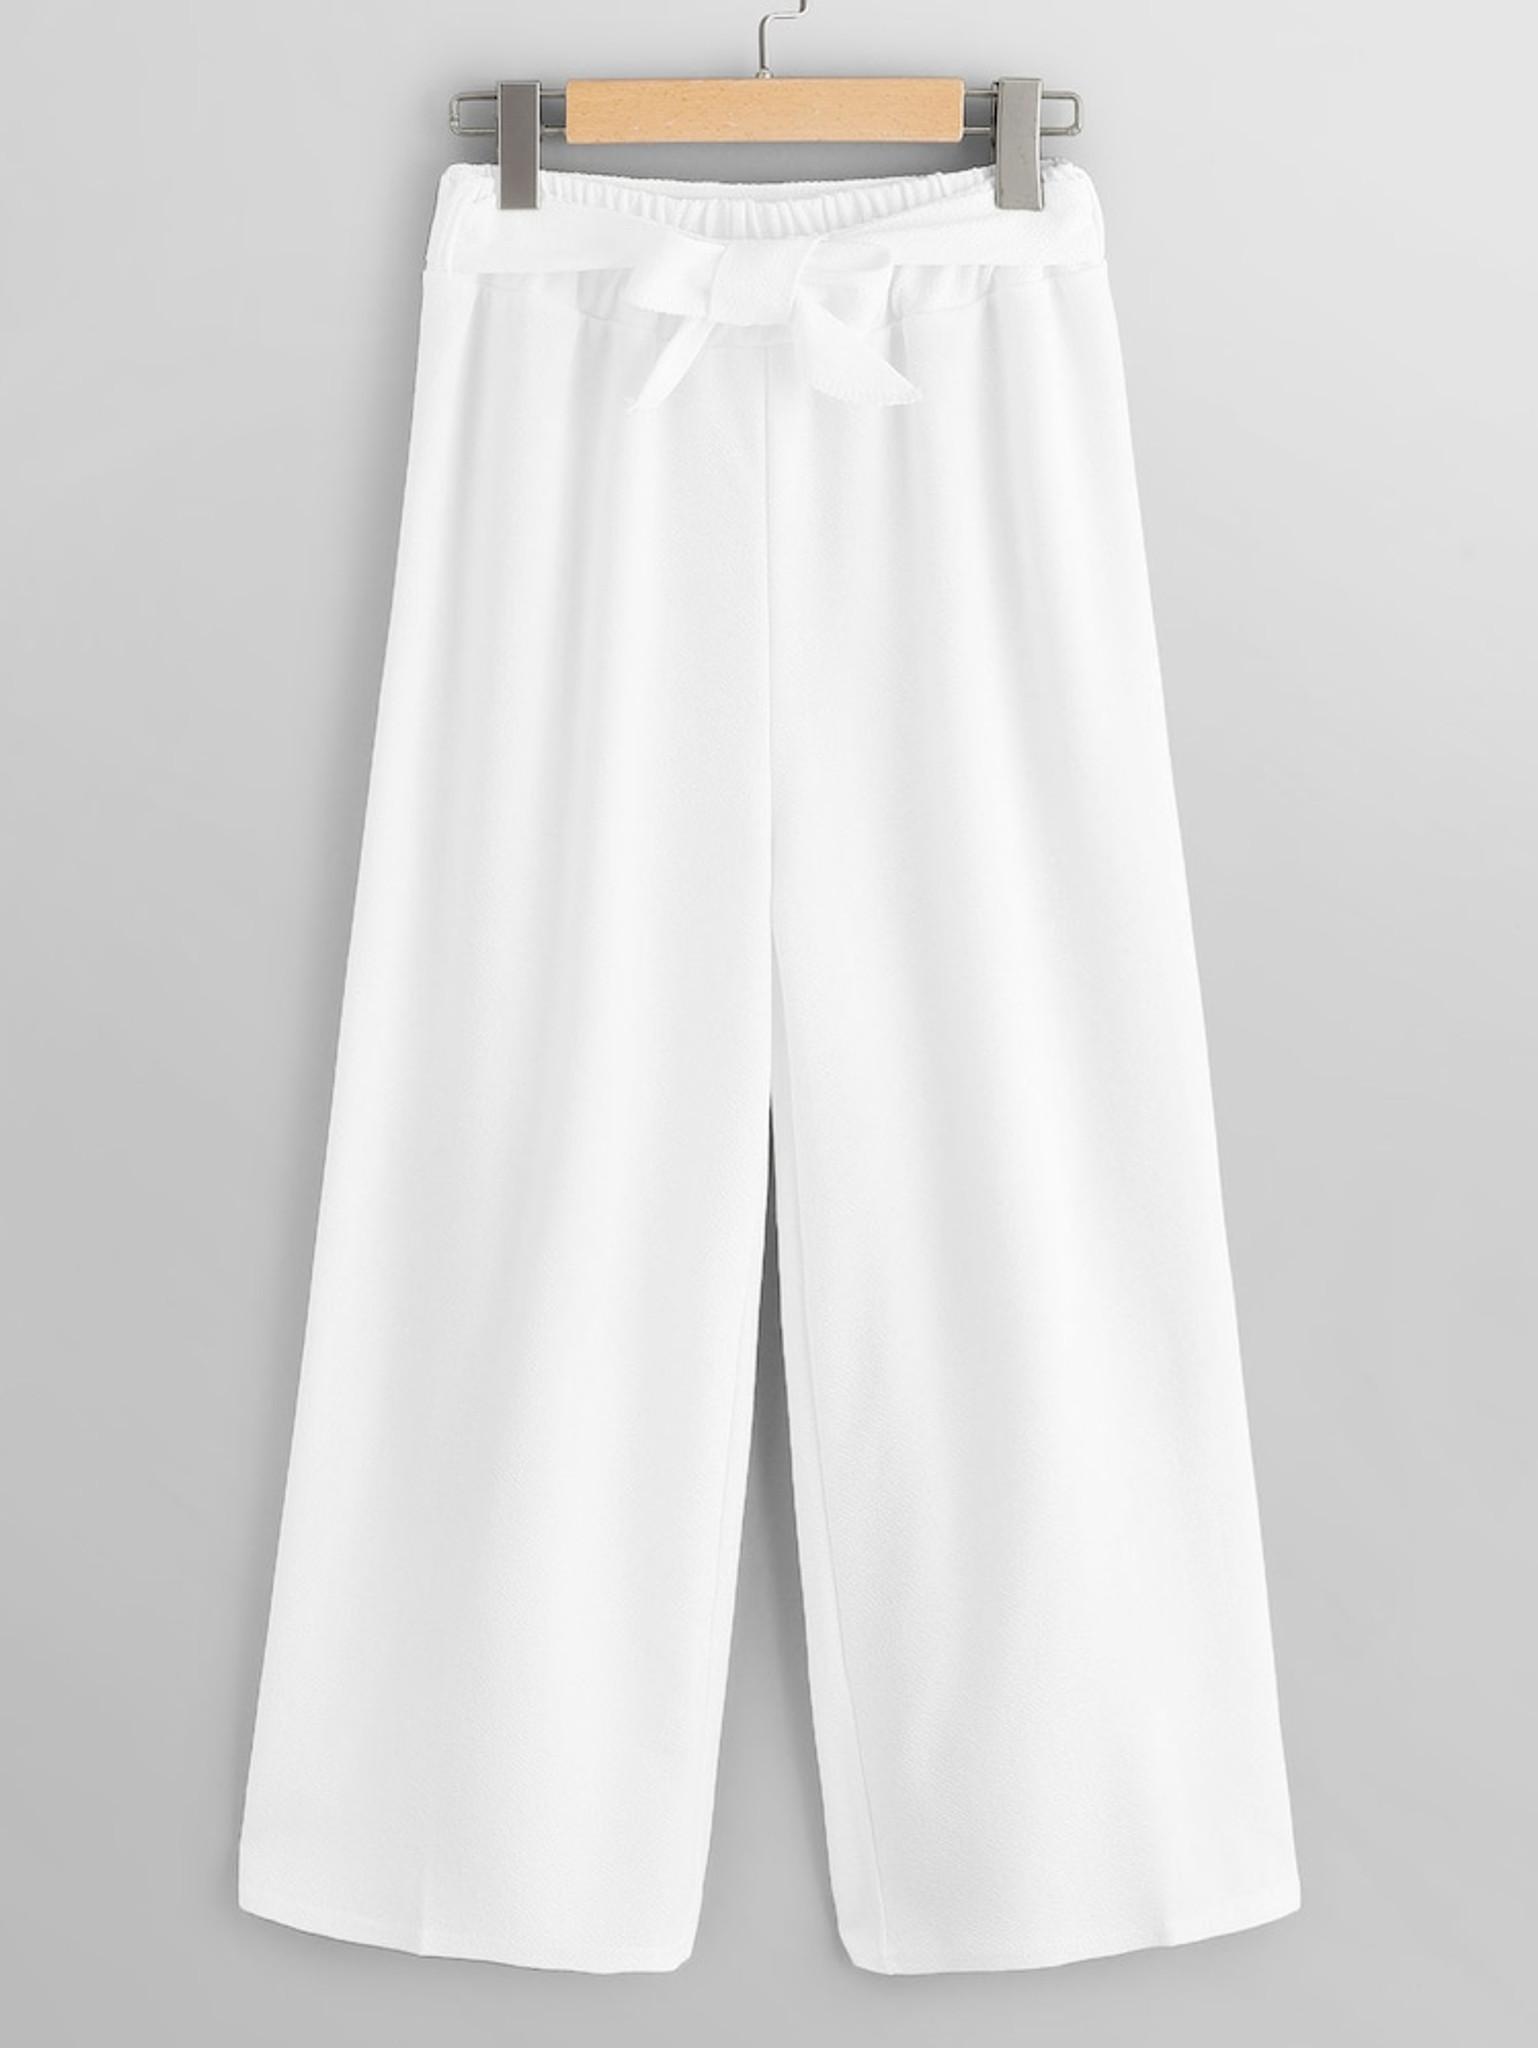 Fifth Avenue GTTWP21 Waist Belted Wide Leg Pants - White